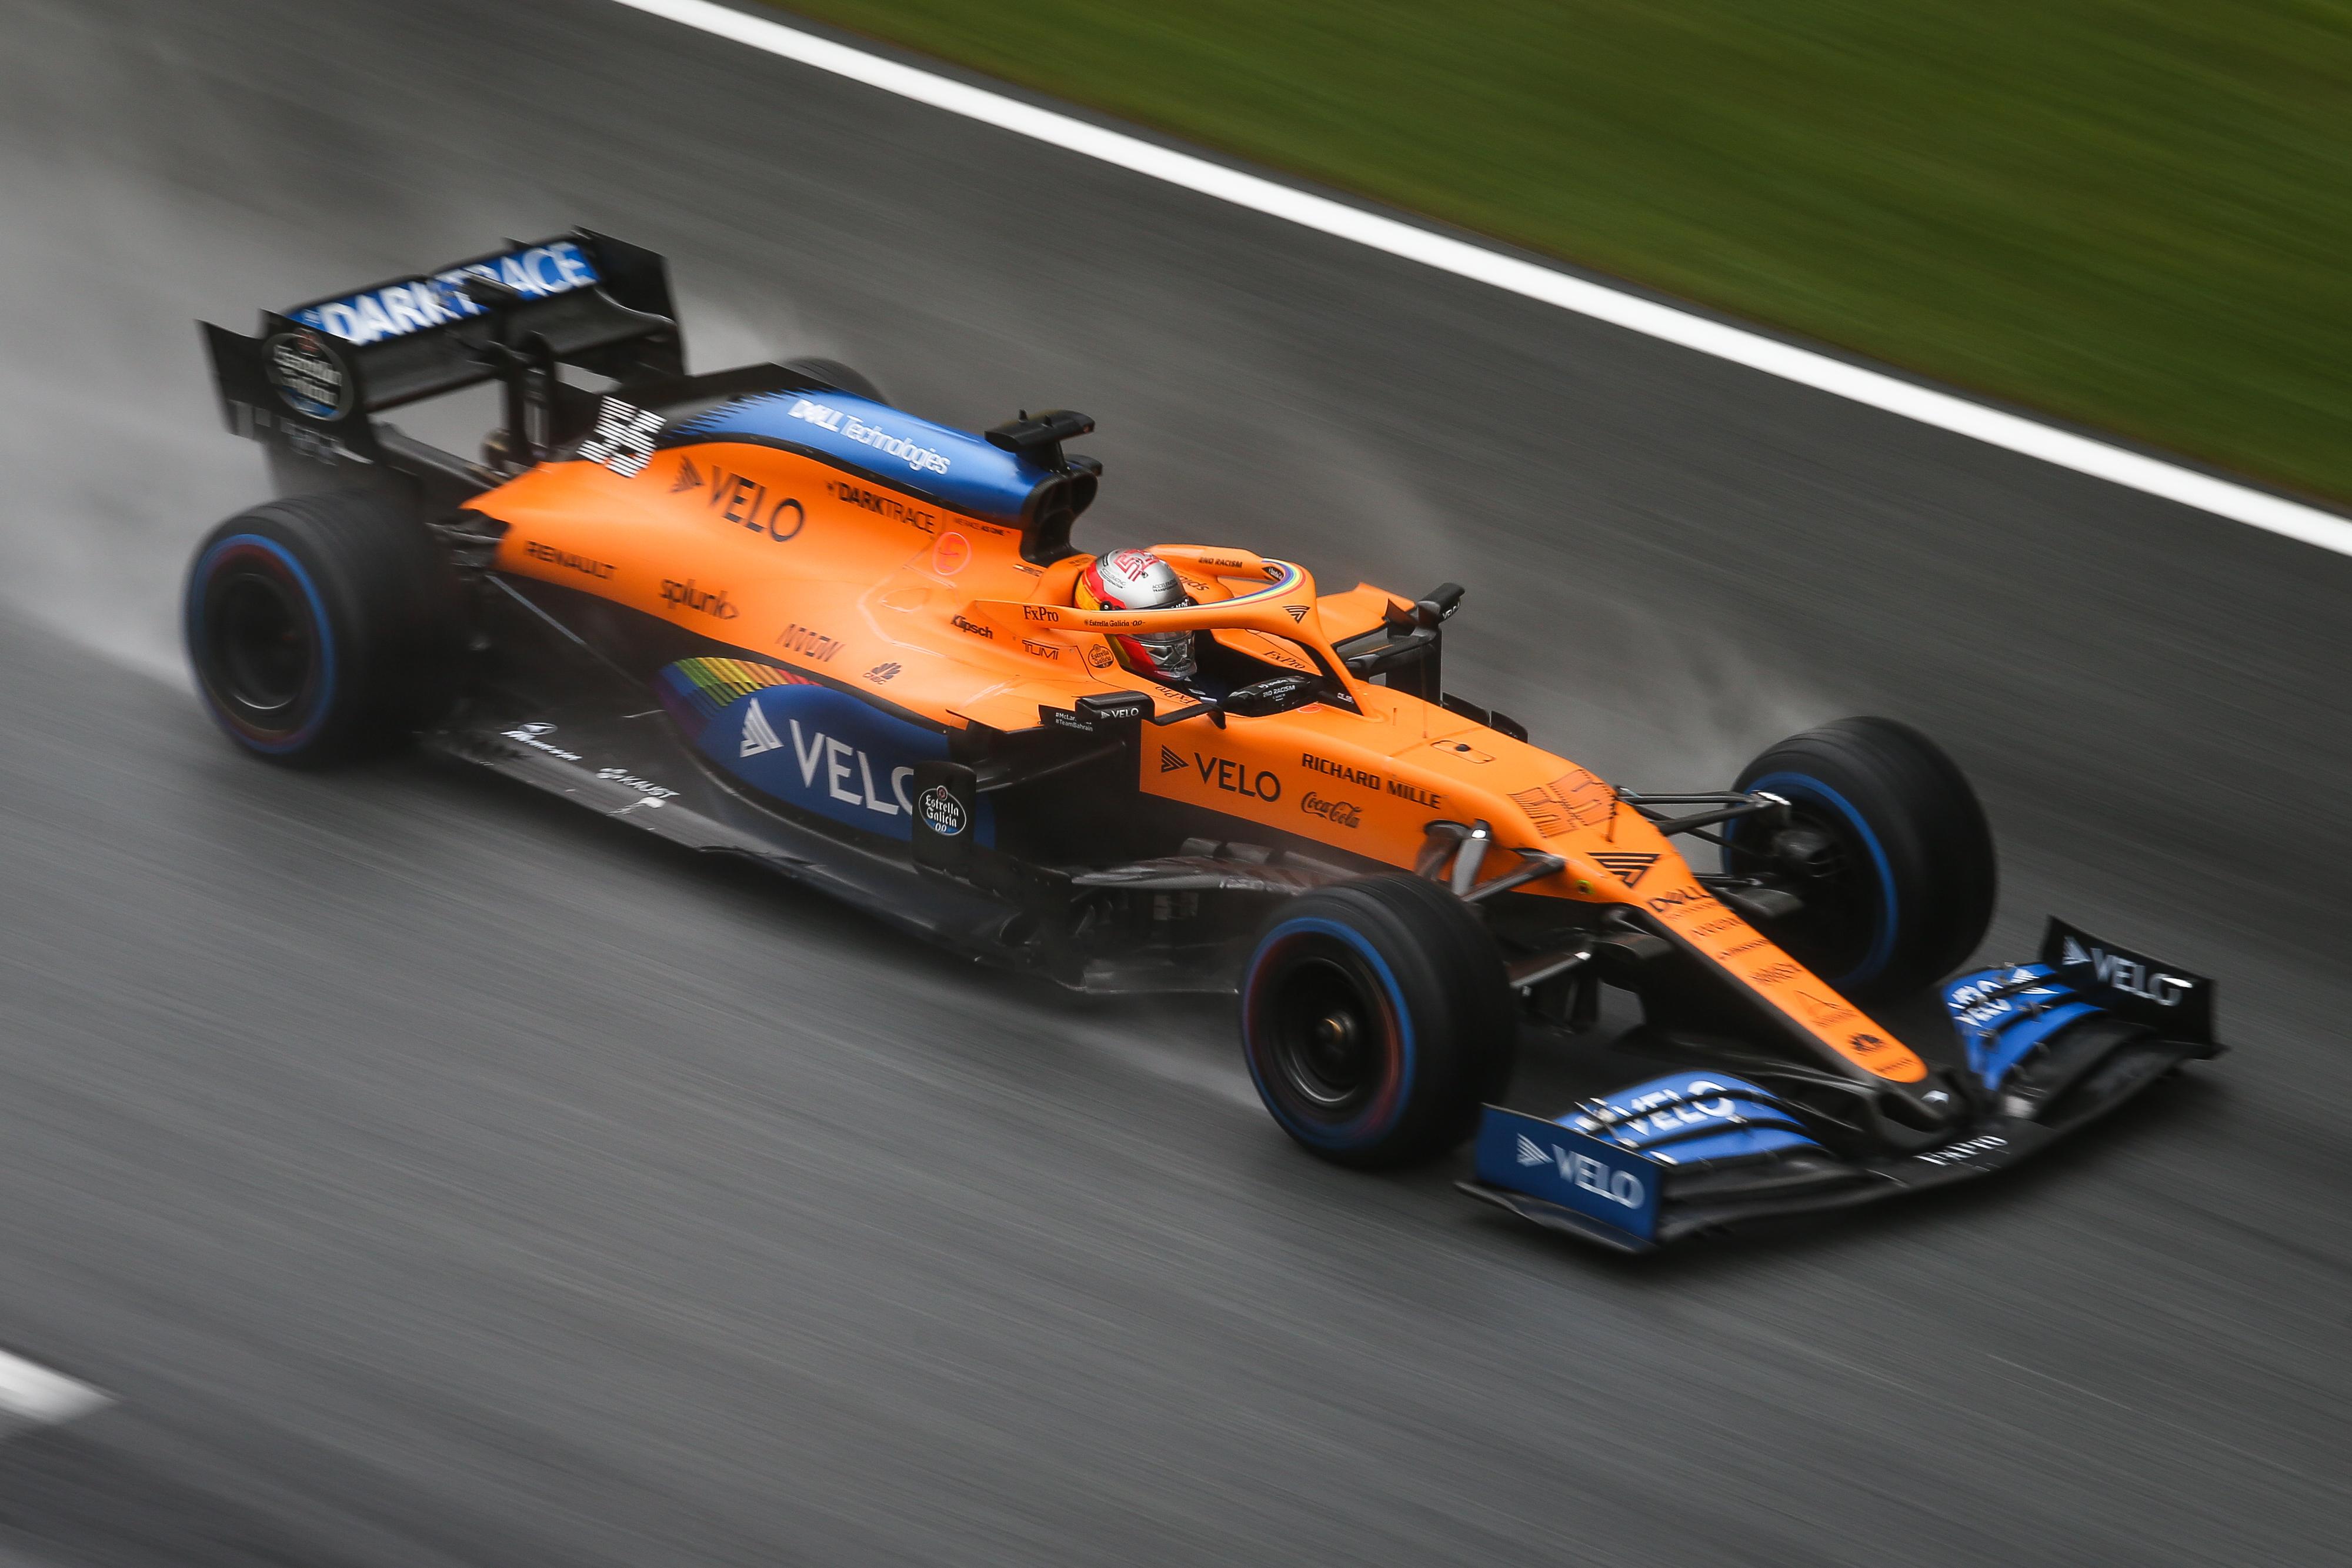 Carlos Sainz Jr McLaren Styrian Grand Prix 2020